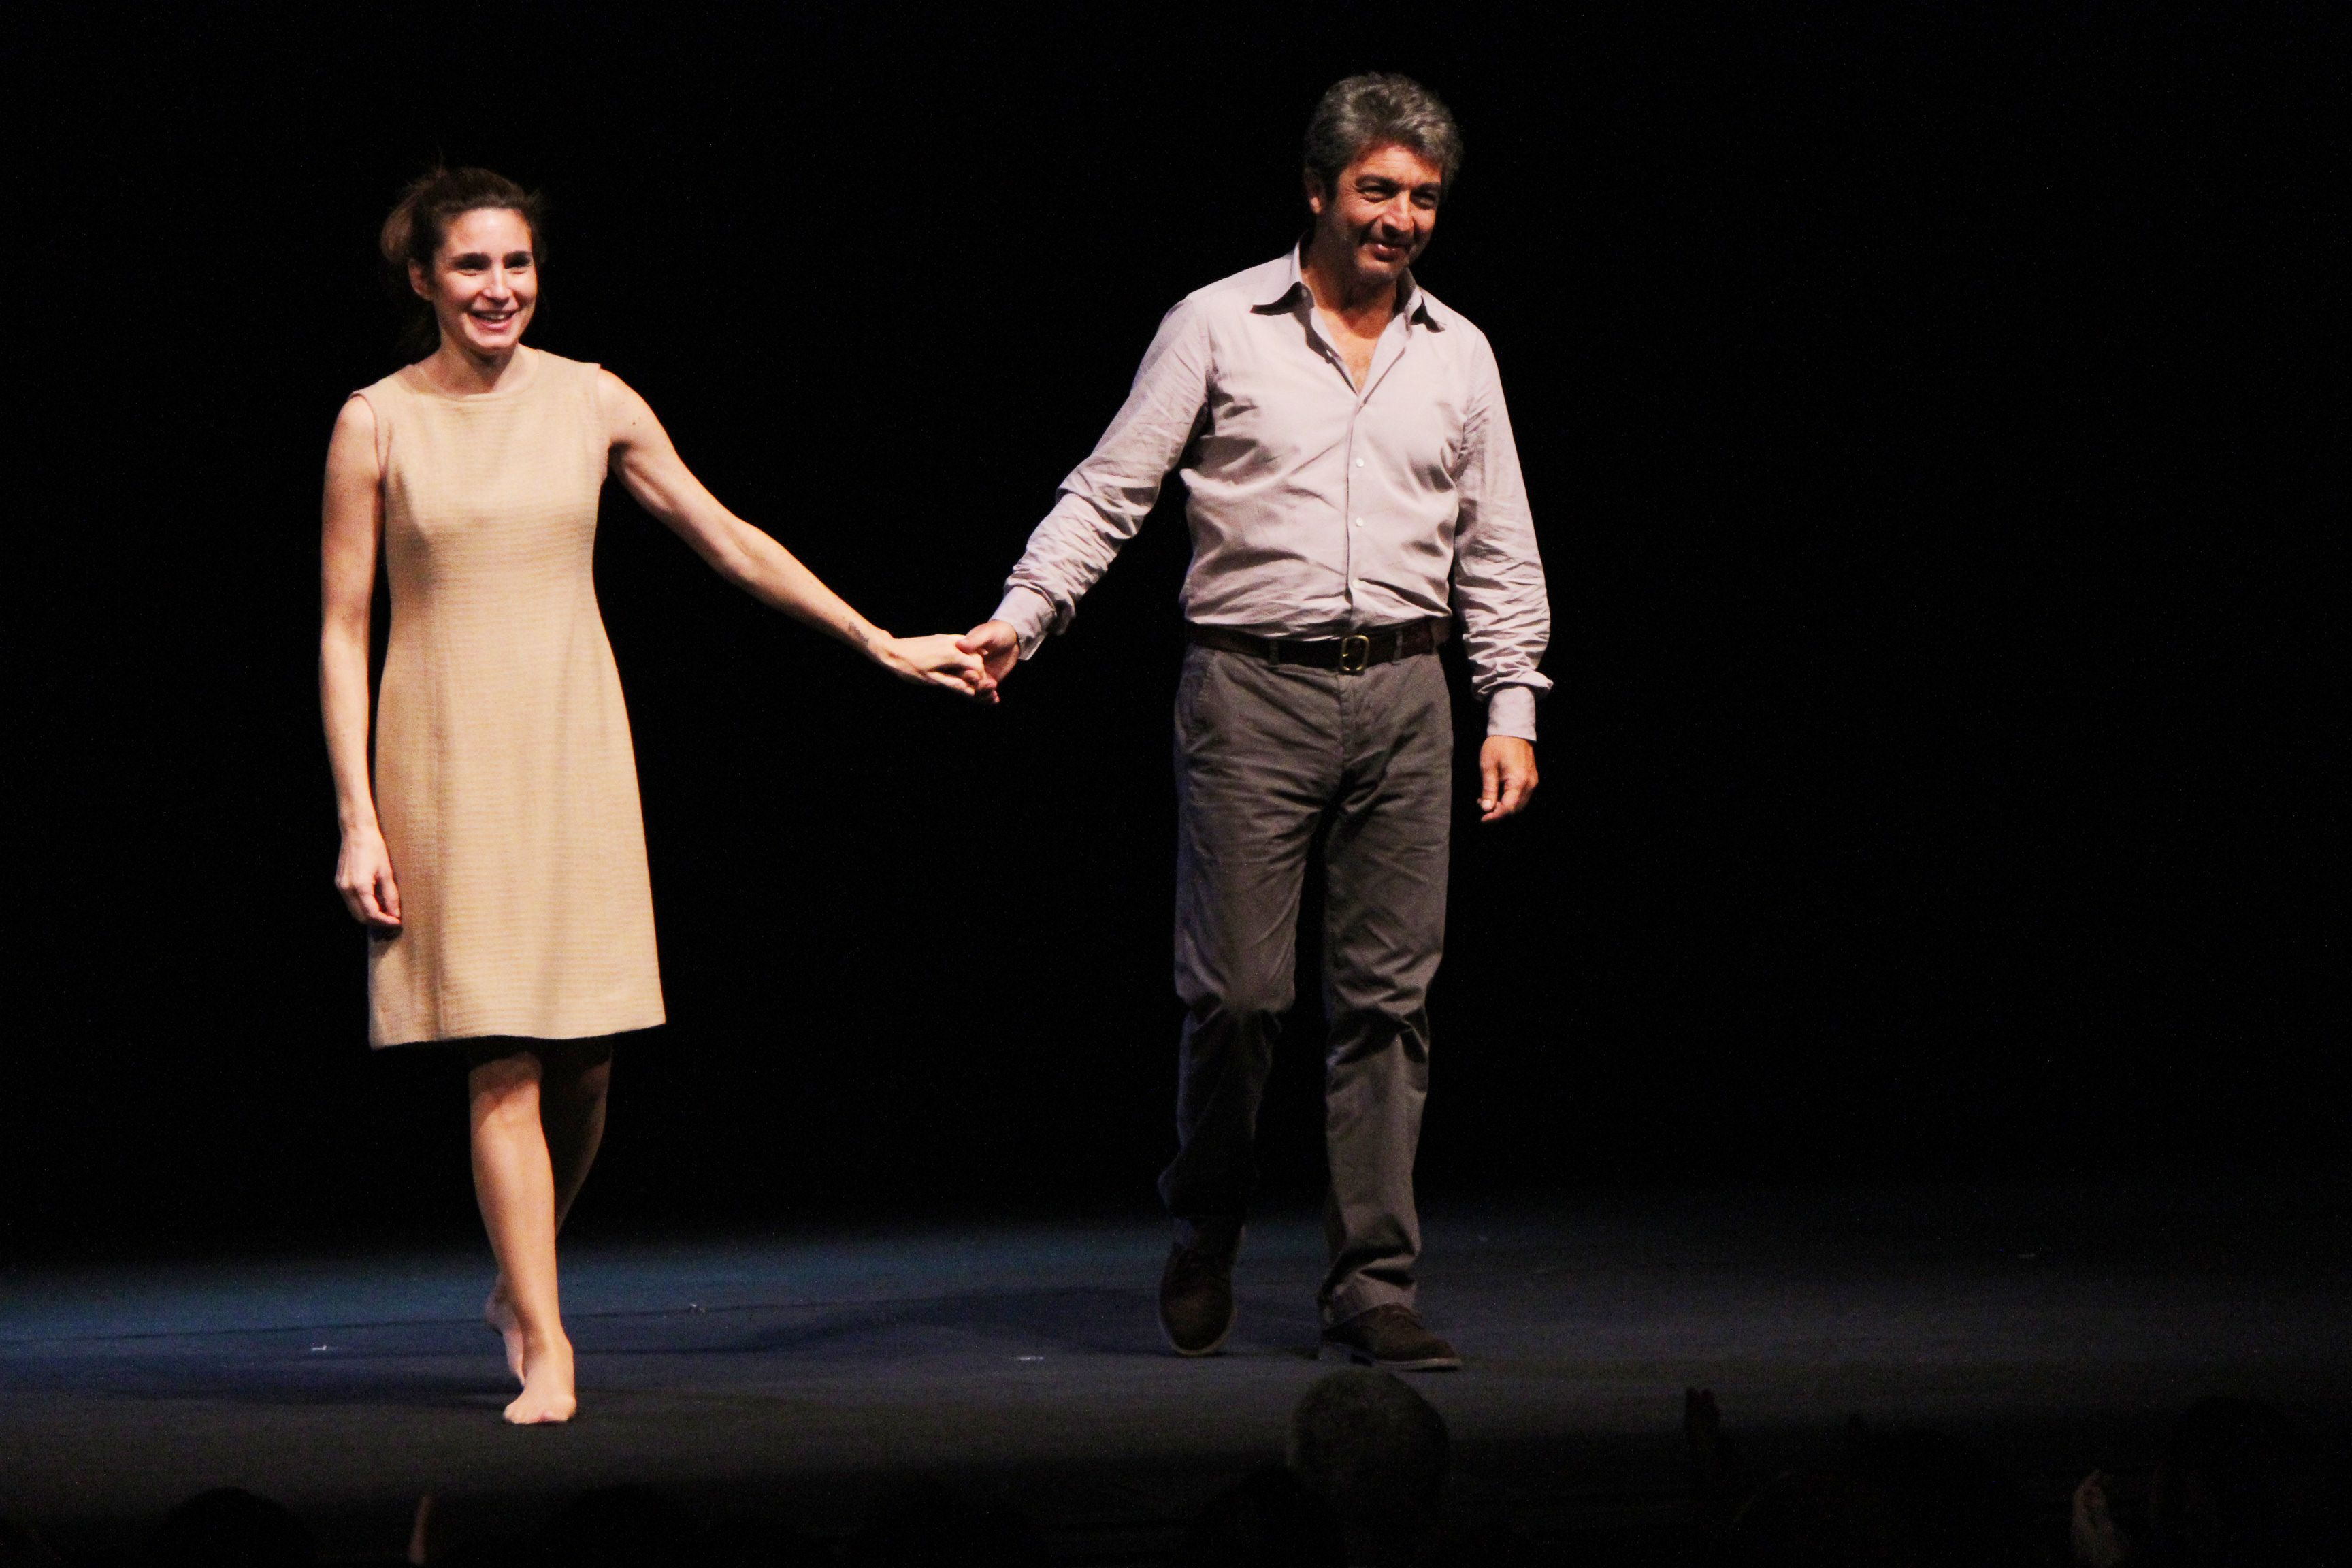 RICARDO DARIN – VALERIA BERTUCCELLI en el Teatro Maipo